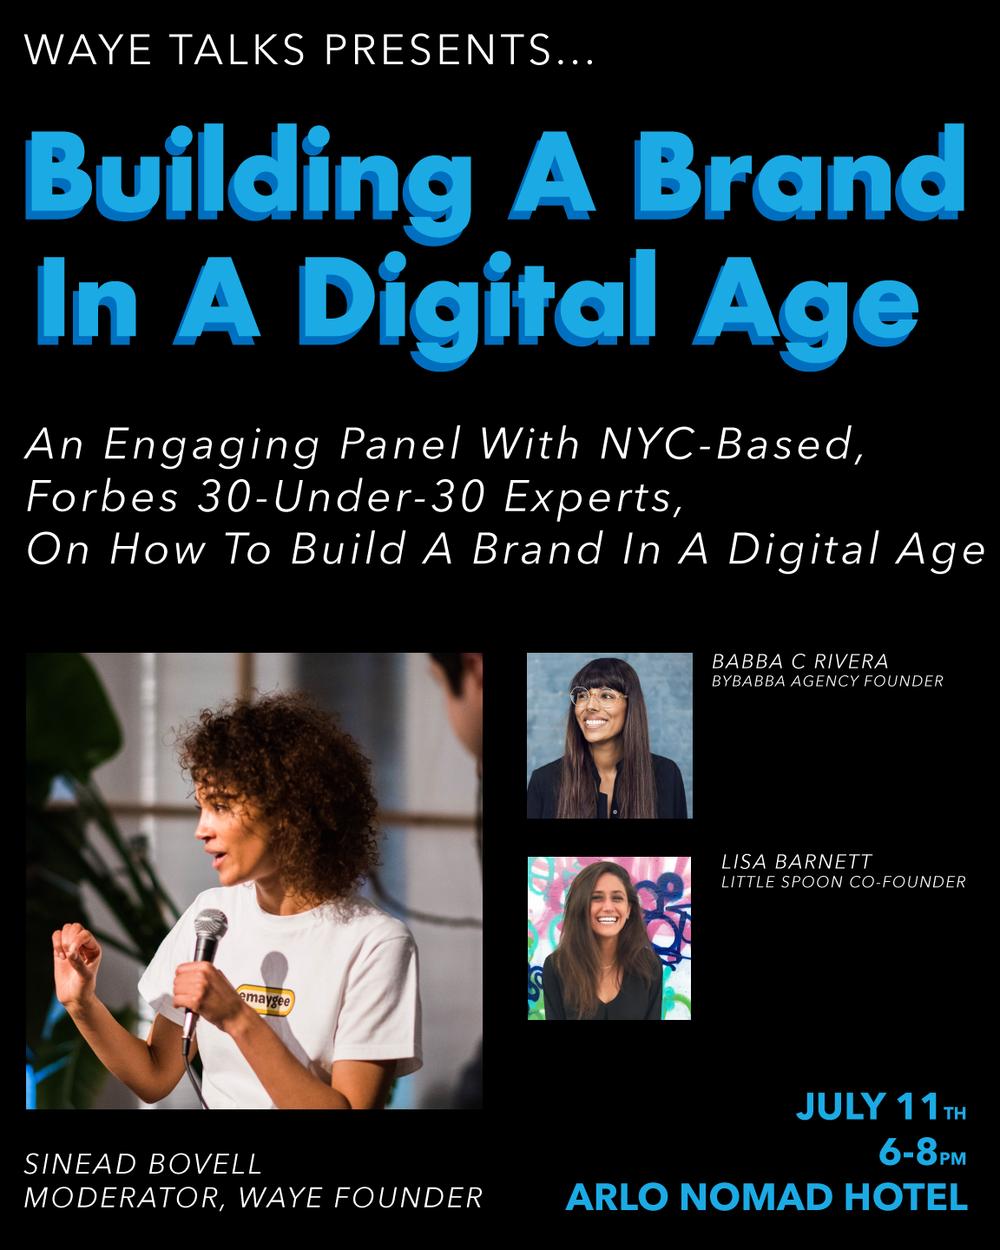 WAYE Talks - Building a Brand in a Digital Age